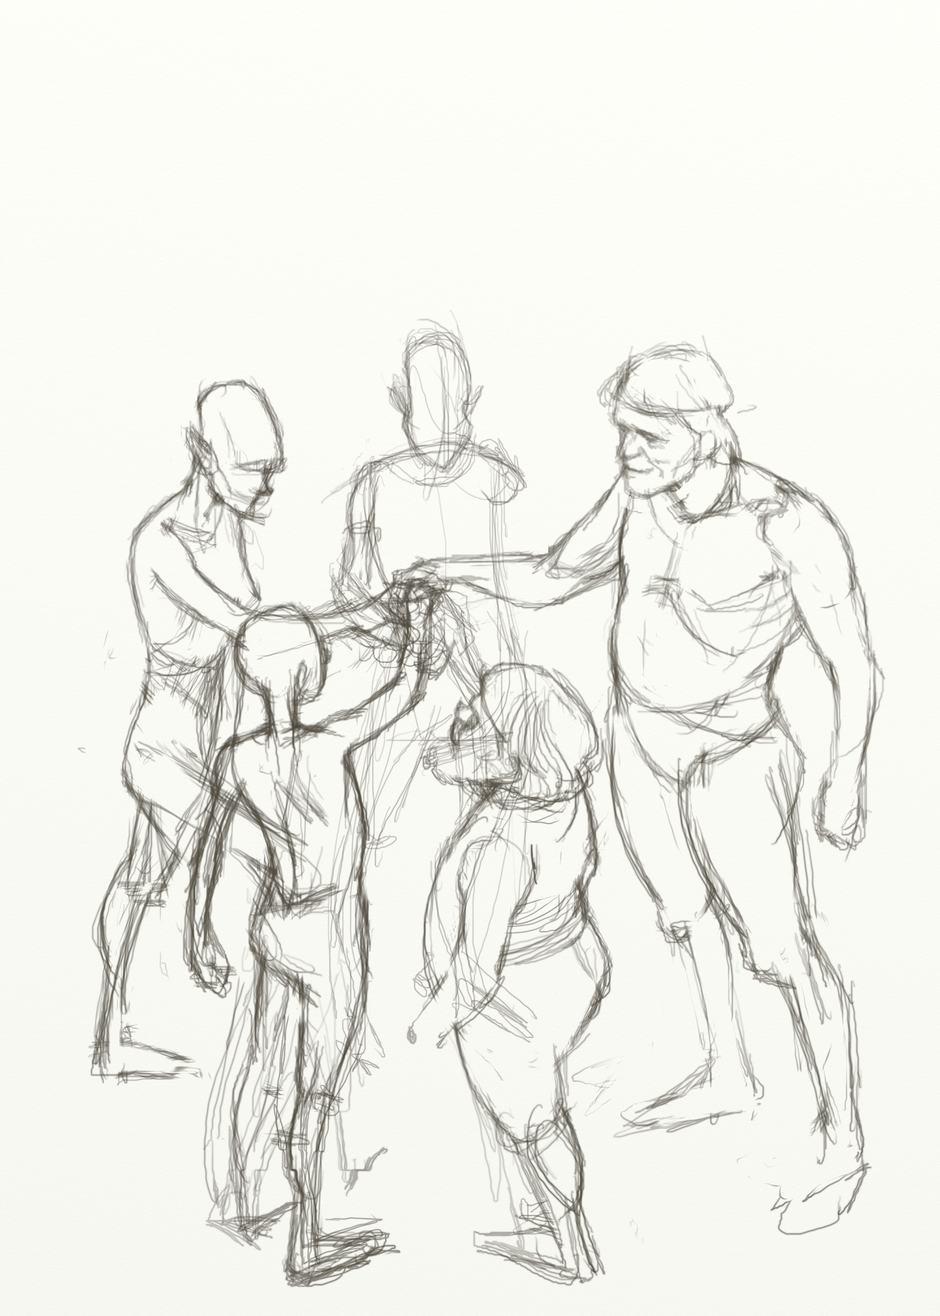 Refined pencil sketch of five figures